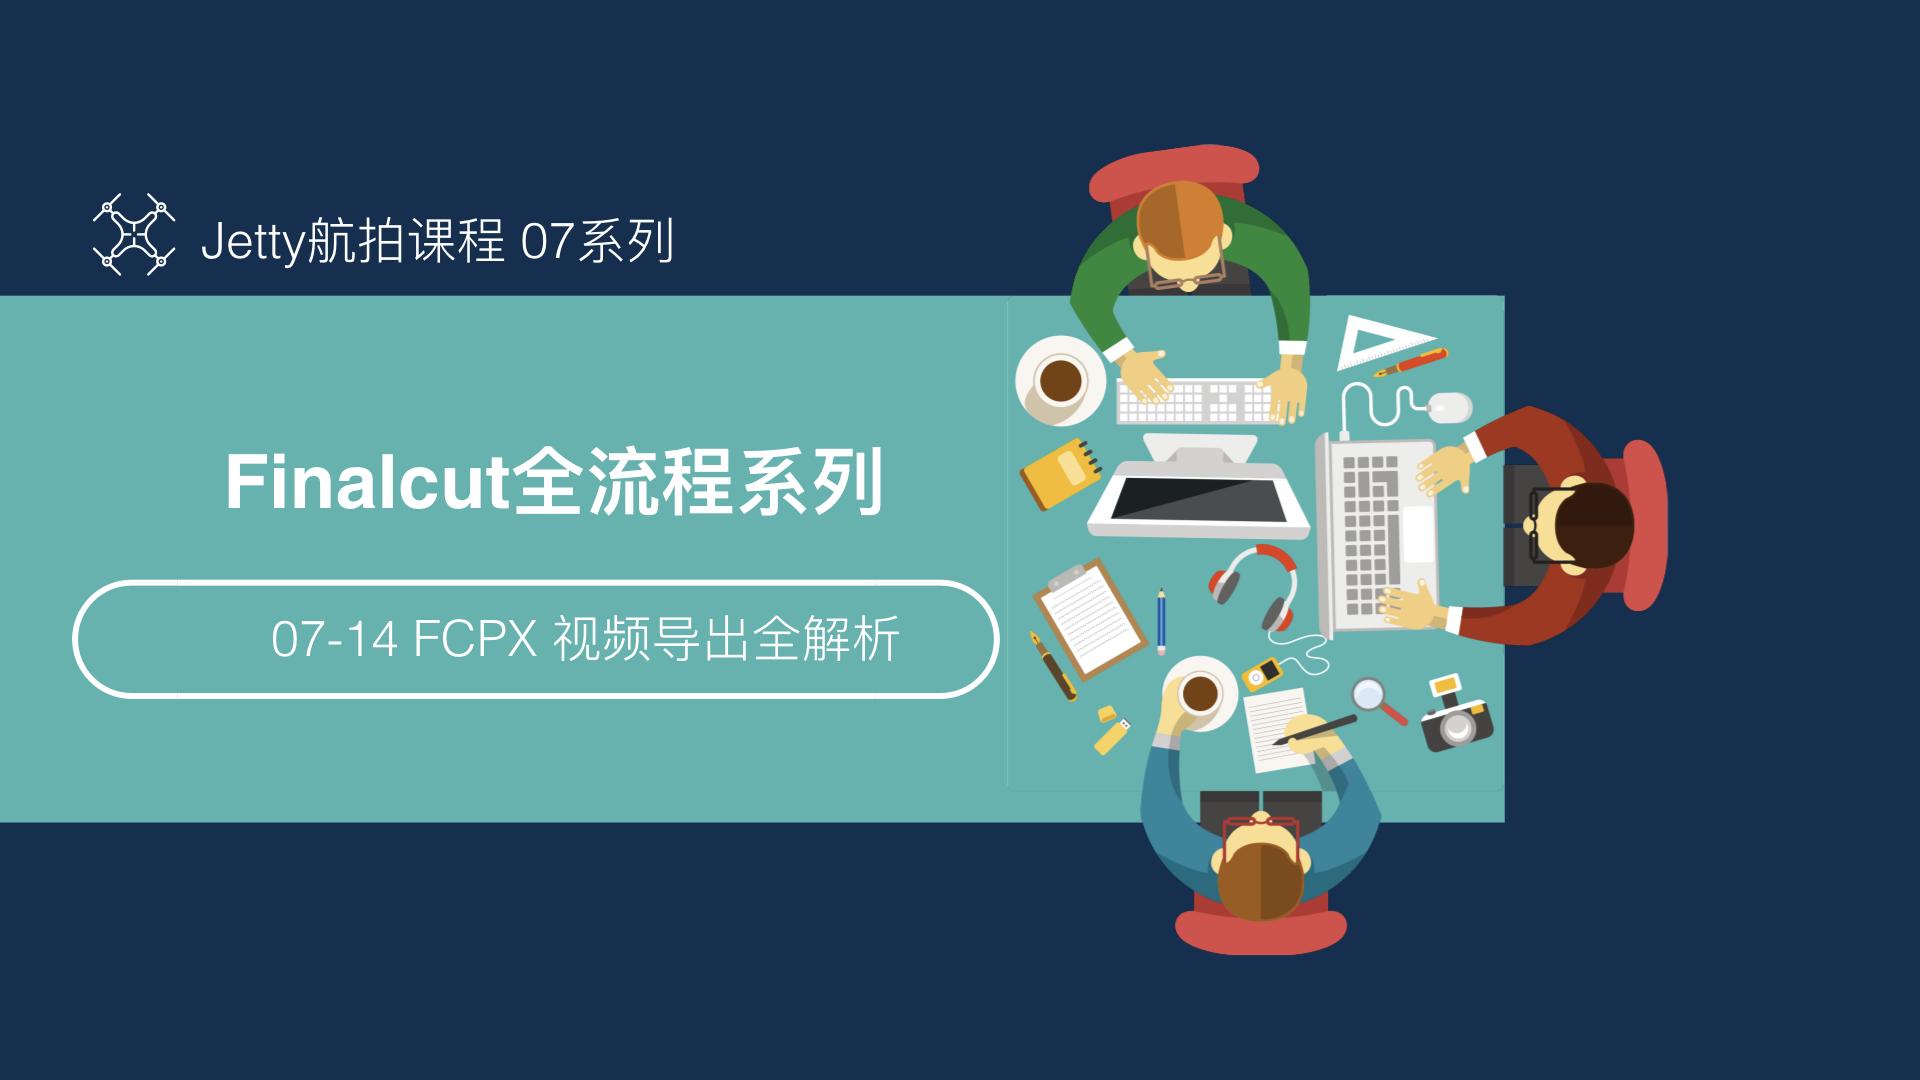 07-14 FCPX视频导出全解析.001.png